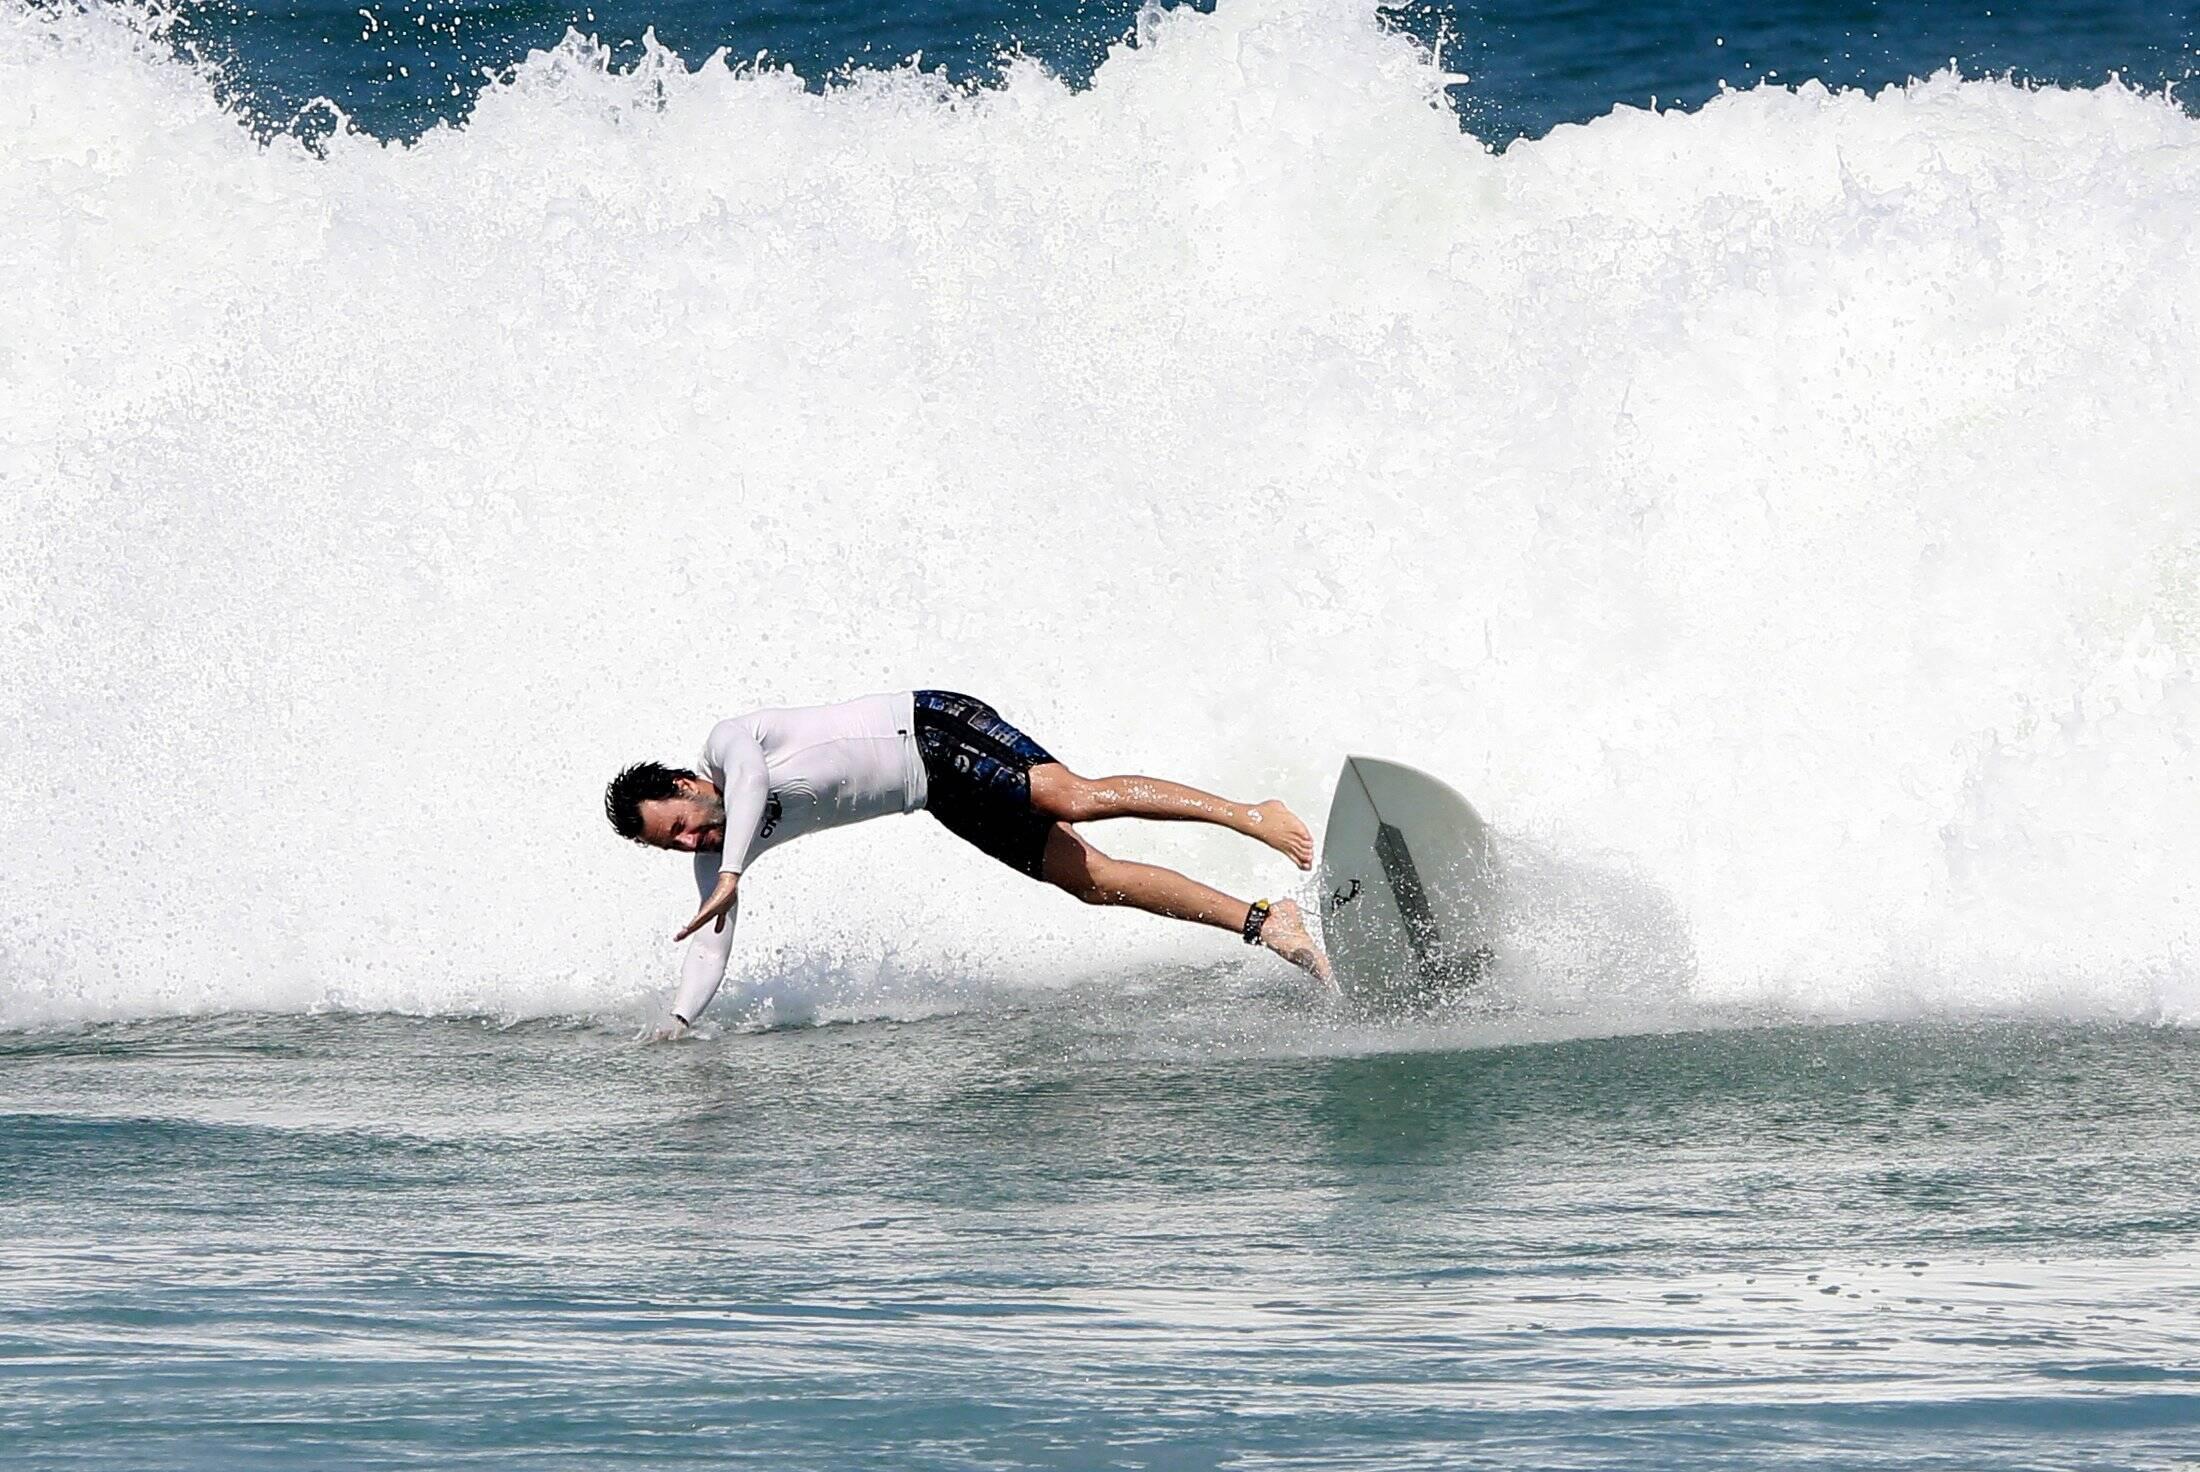 Rodrigo Santoro surfa na praia da macumba, no Rio. Foto: FOTOS: DILSON SILVA / AGNEWS